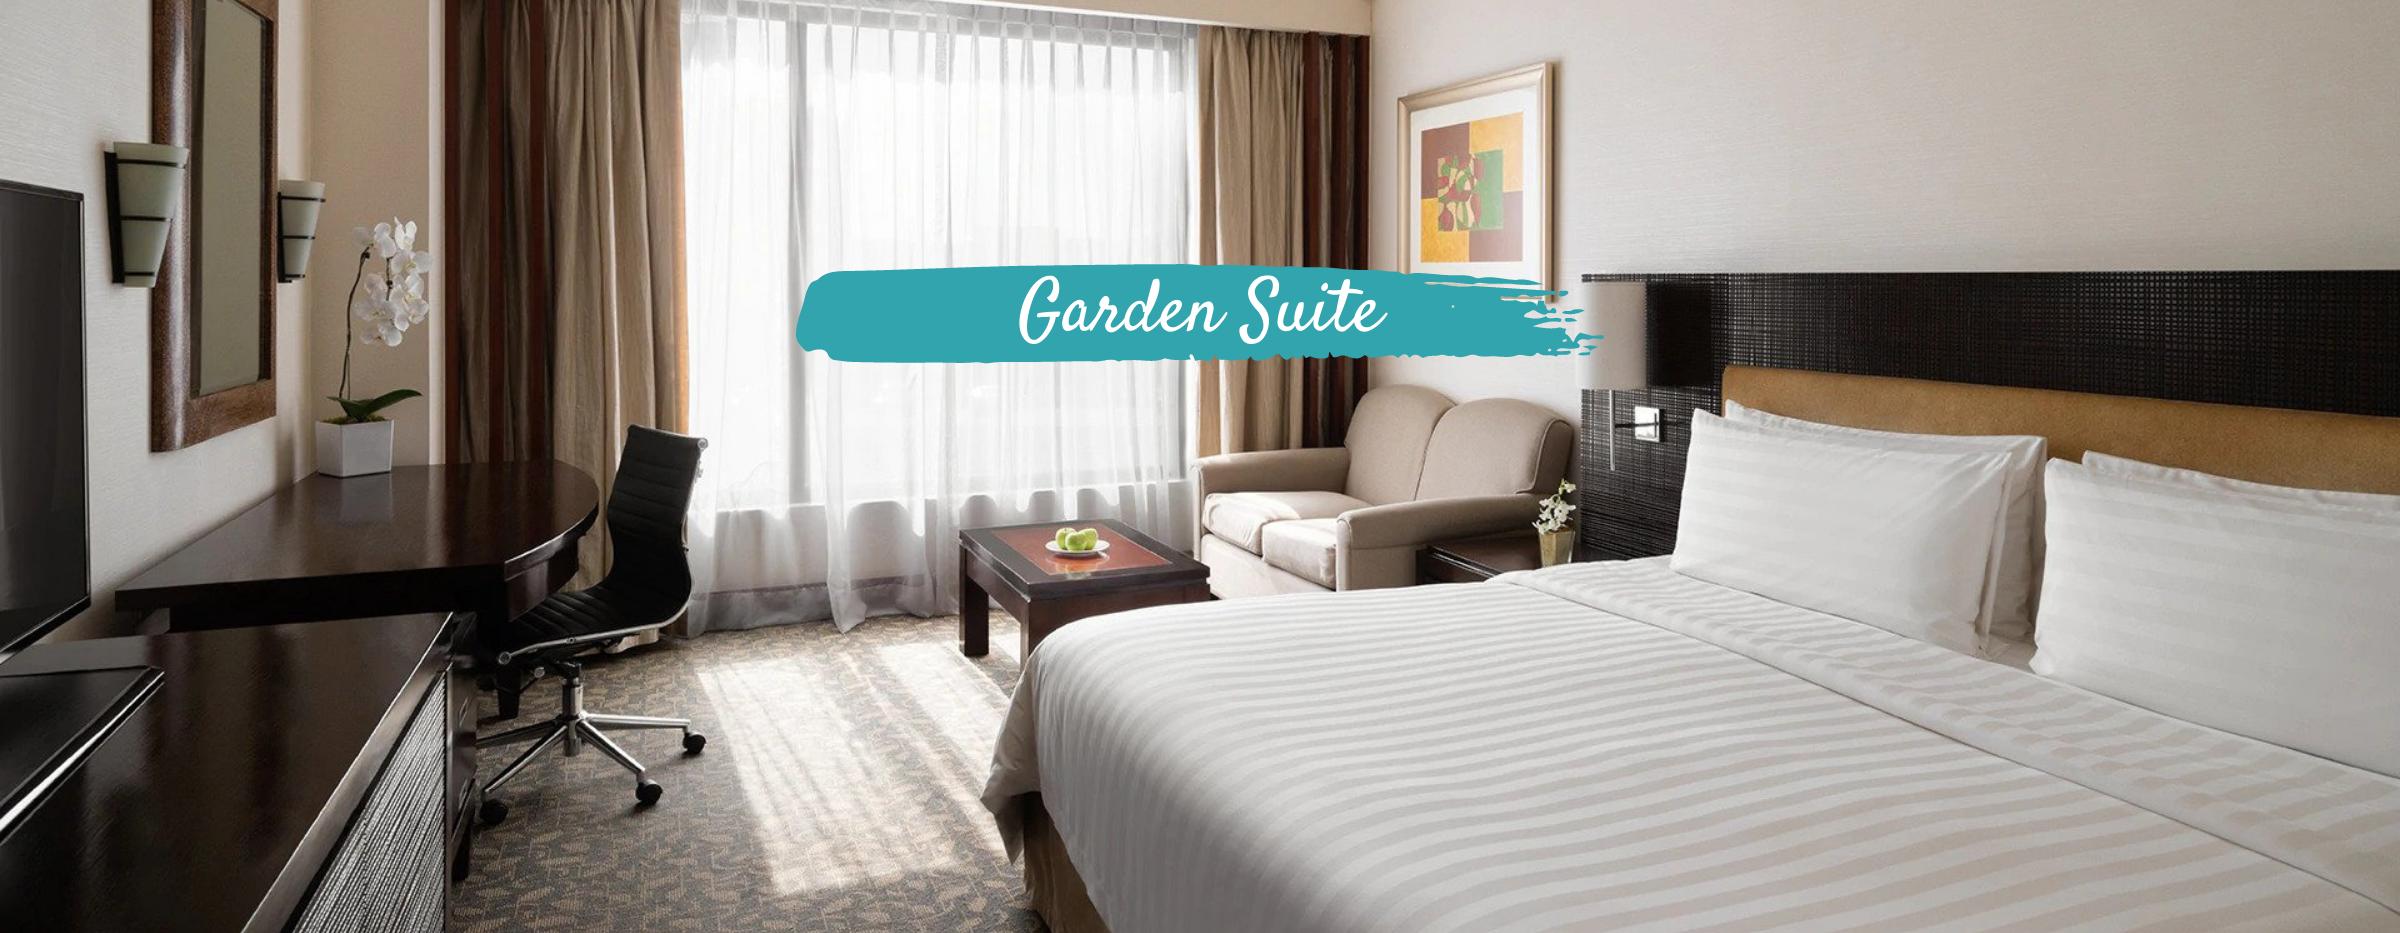 Edsa Shangri-La - Garden Deluxe   HNL to MNL Philippine Airlines+ Hotel Quarantine Package